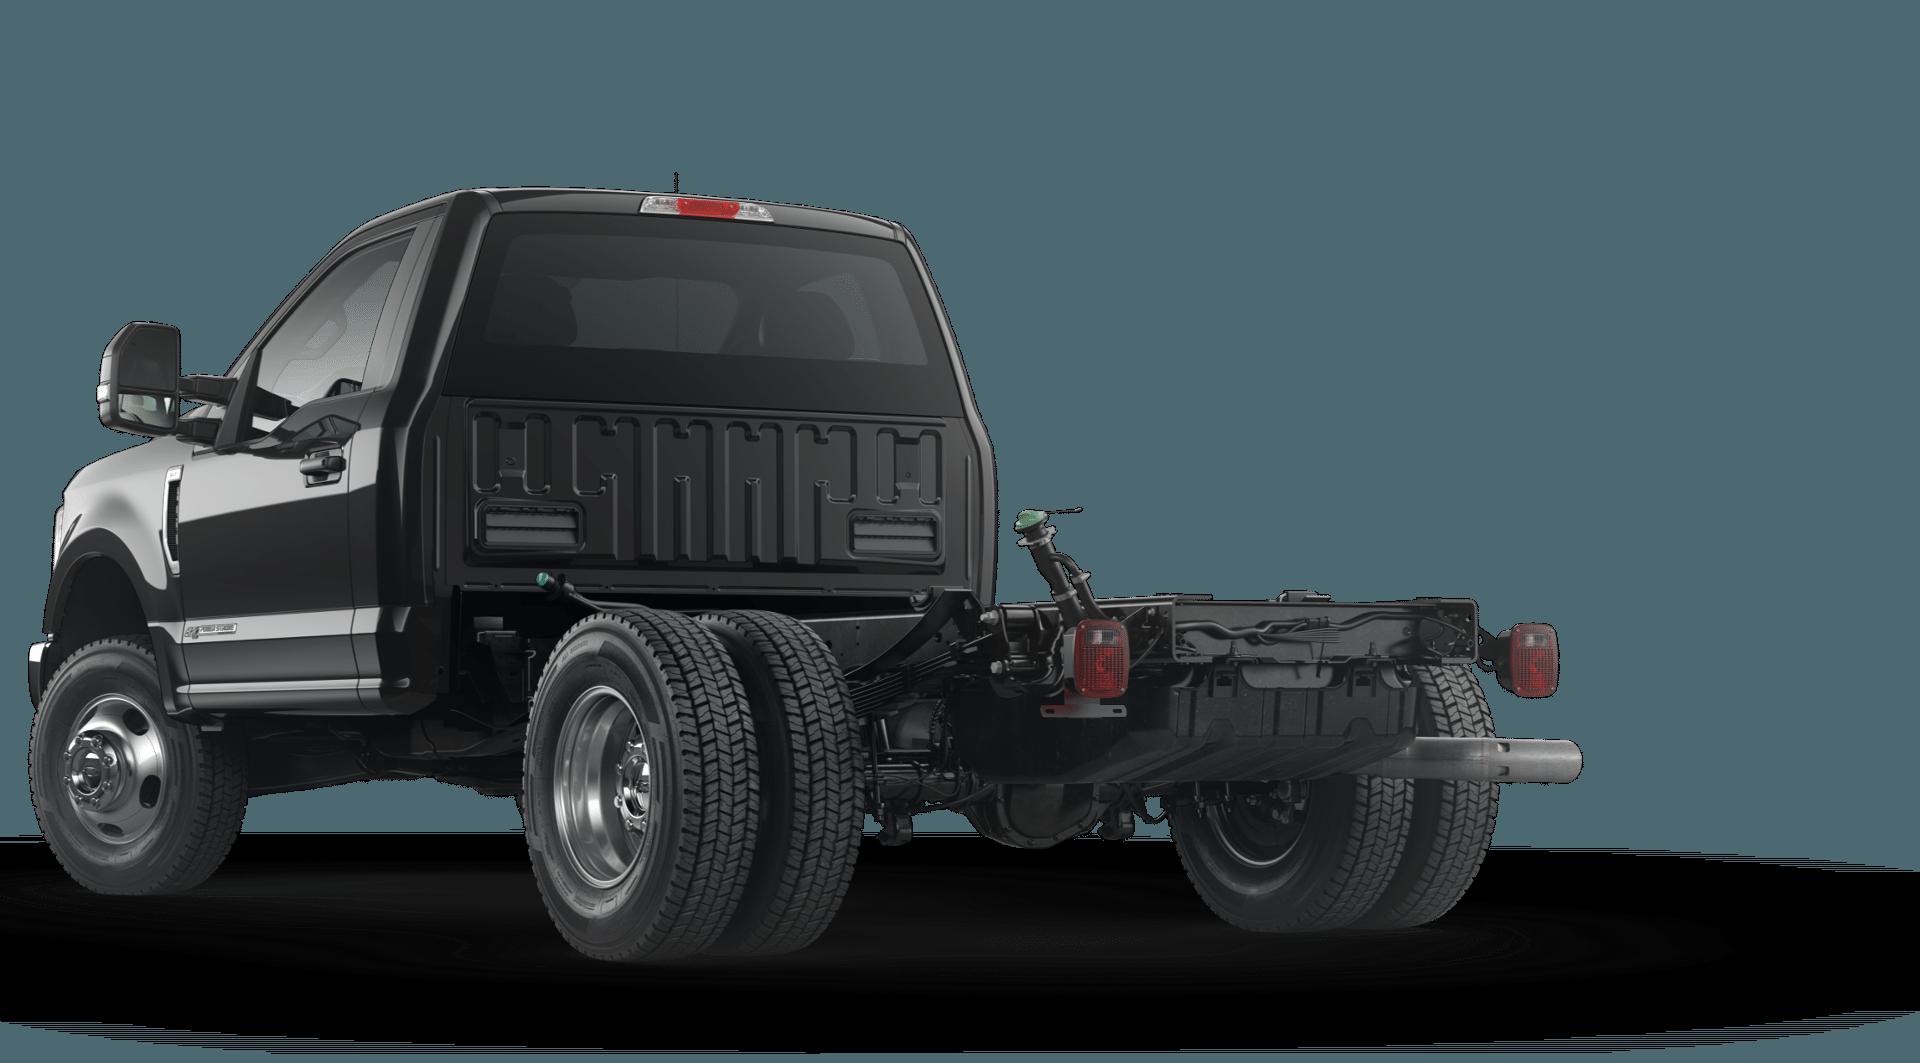 2019 F-350 Regular Cab DRW 4x4,  Cab Chassis #N8346 - photo 2